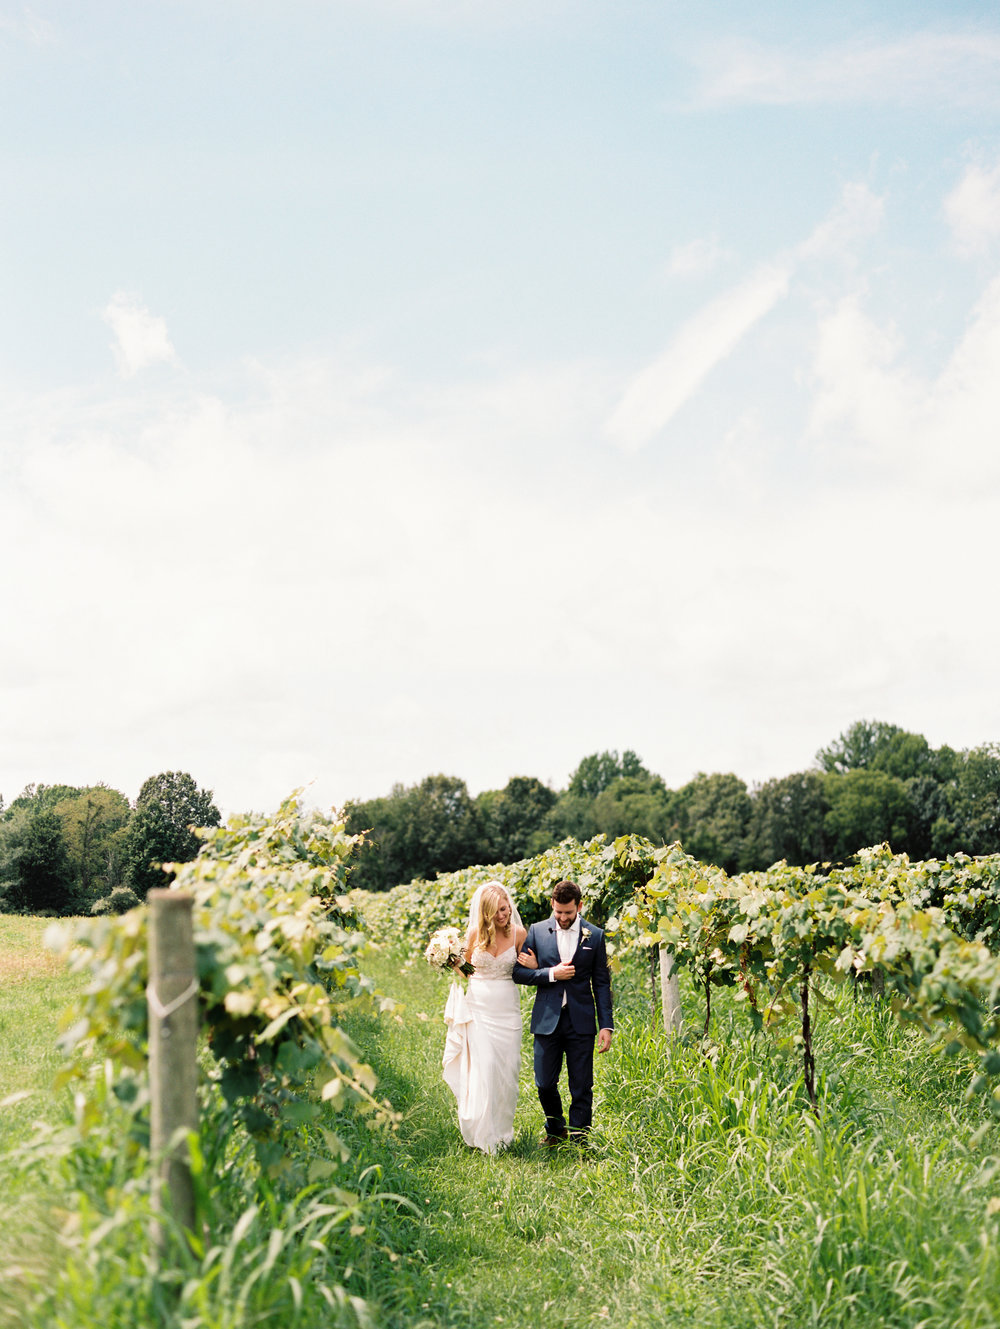 02-Smith-Wedding-Portraits-016.jpg